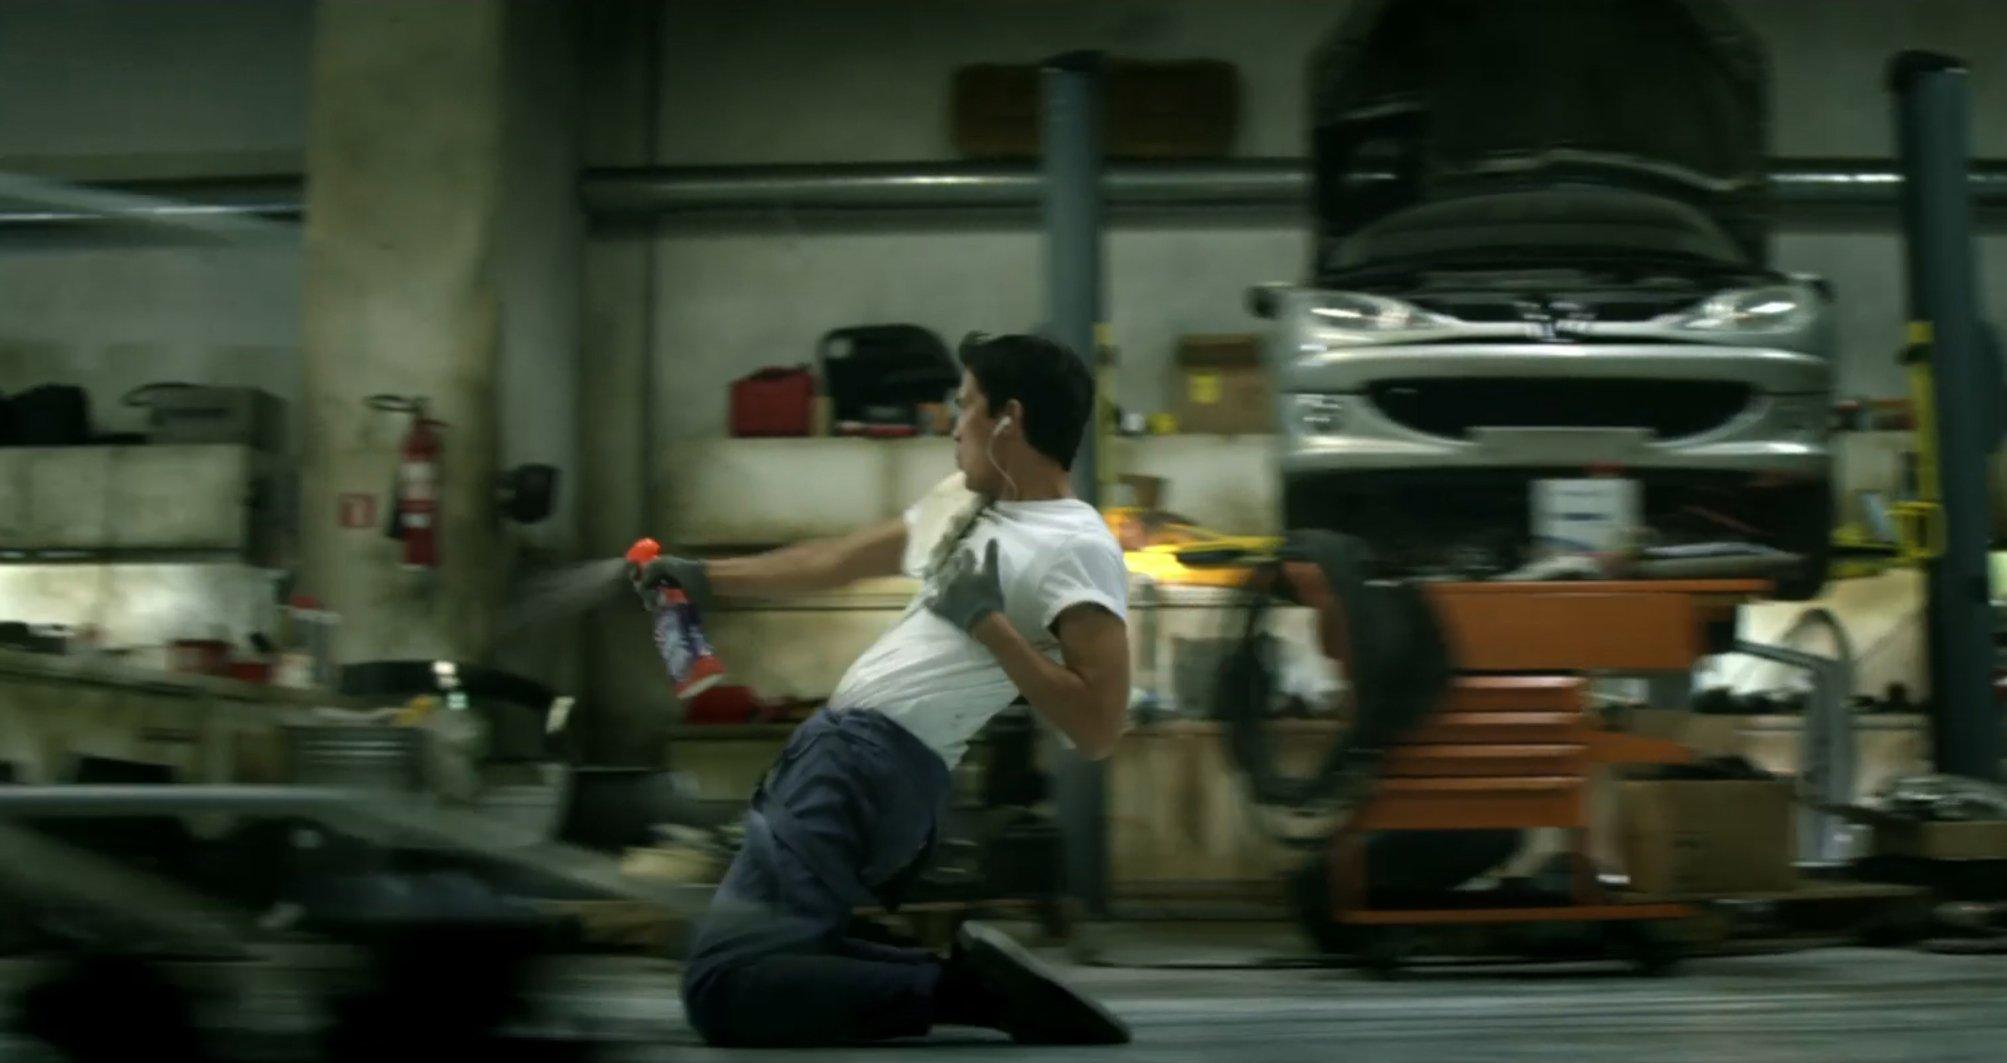 cillit_bang_dancing_mechanic